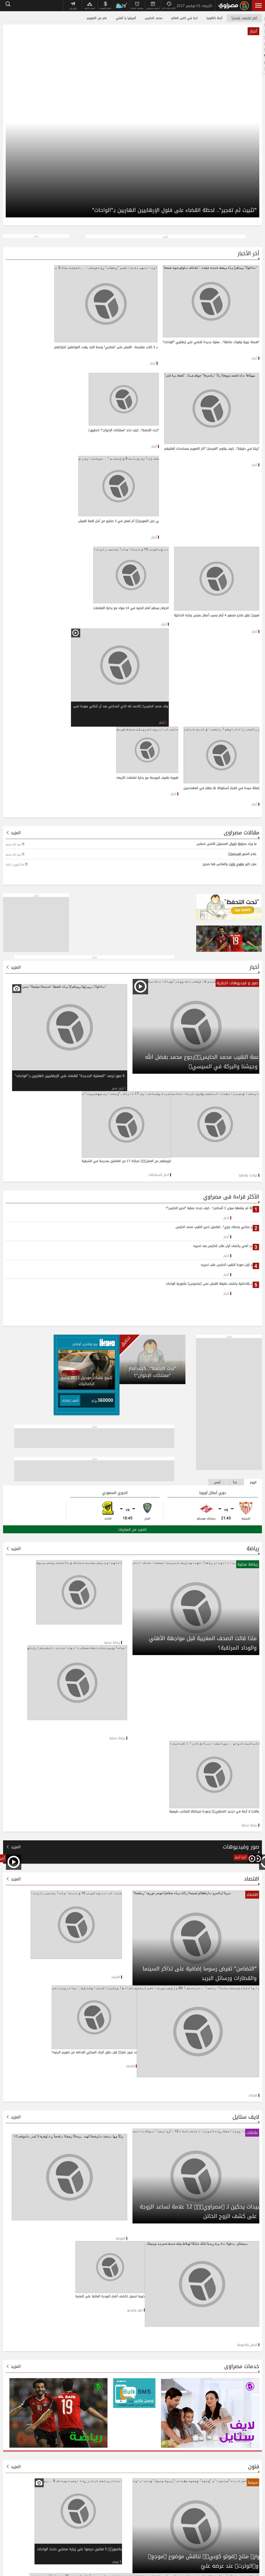 Masrawy at Wednesday Nov. 1, 2017, 11:10 a.m. UTC